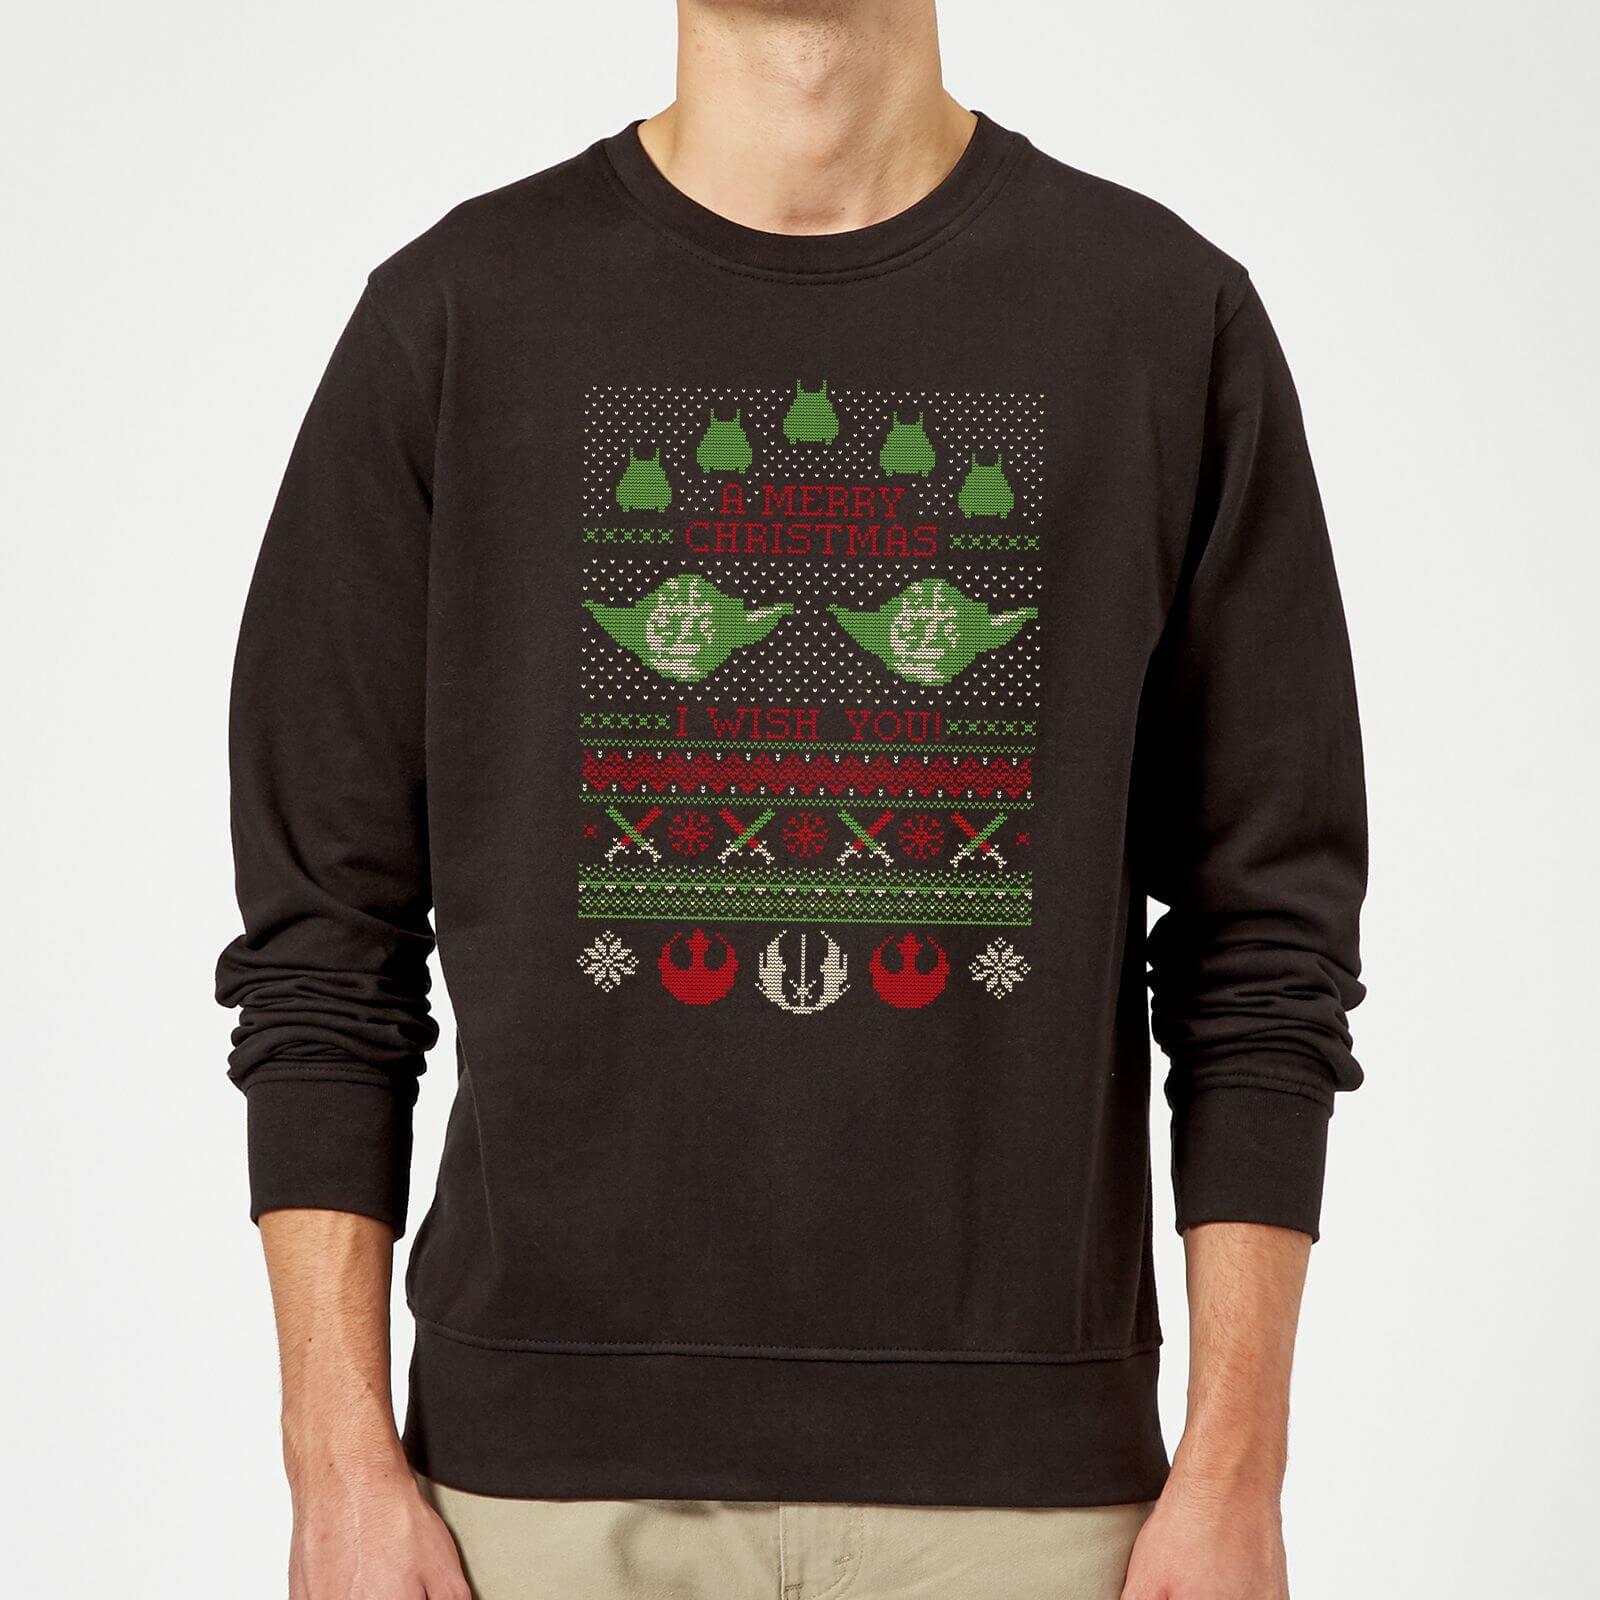 Star Wars Yoda You a Merry Christmas We Wish Knit Pattern Mens Sweatshirt